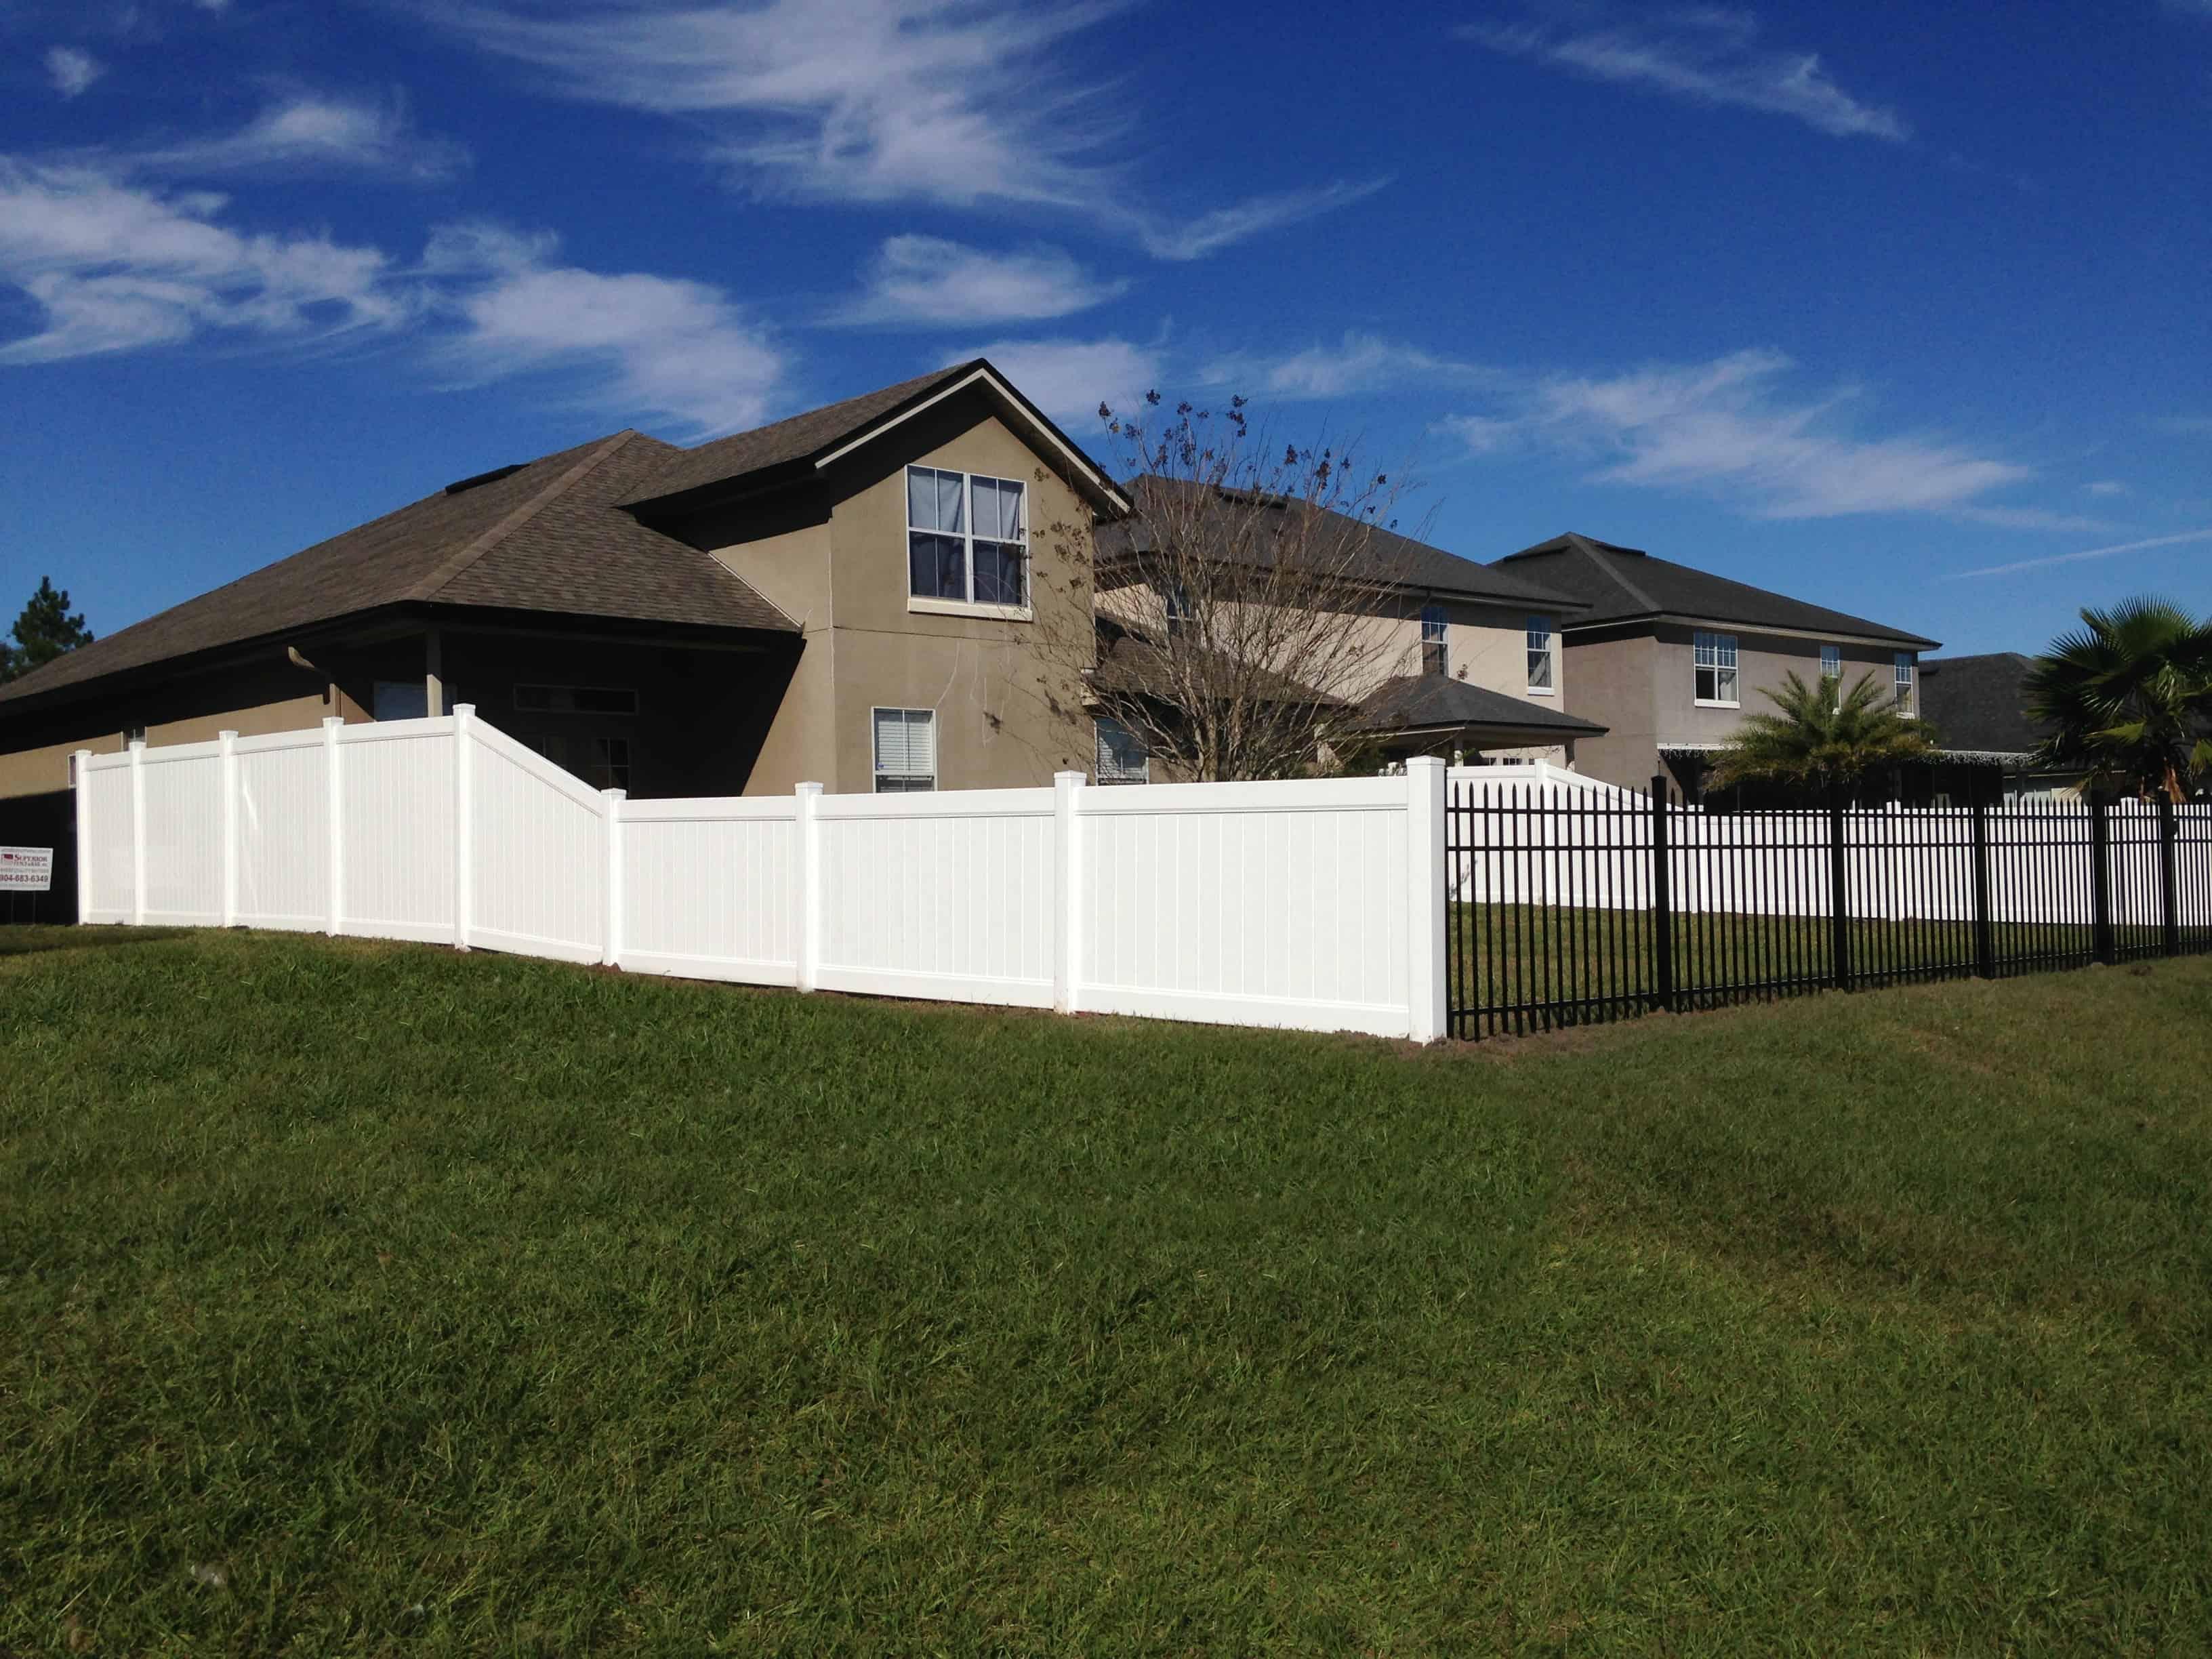 Nashville Fence Company Fence Outlet